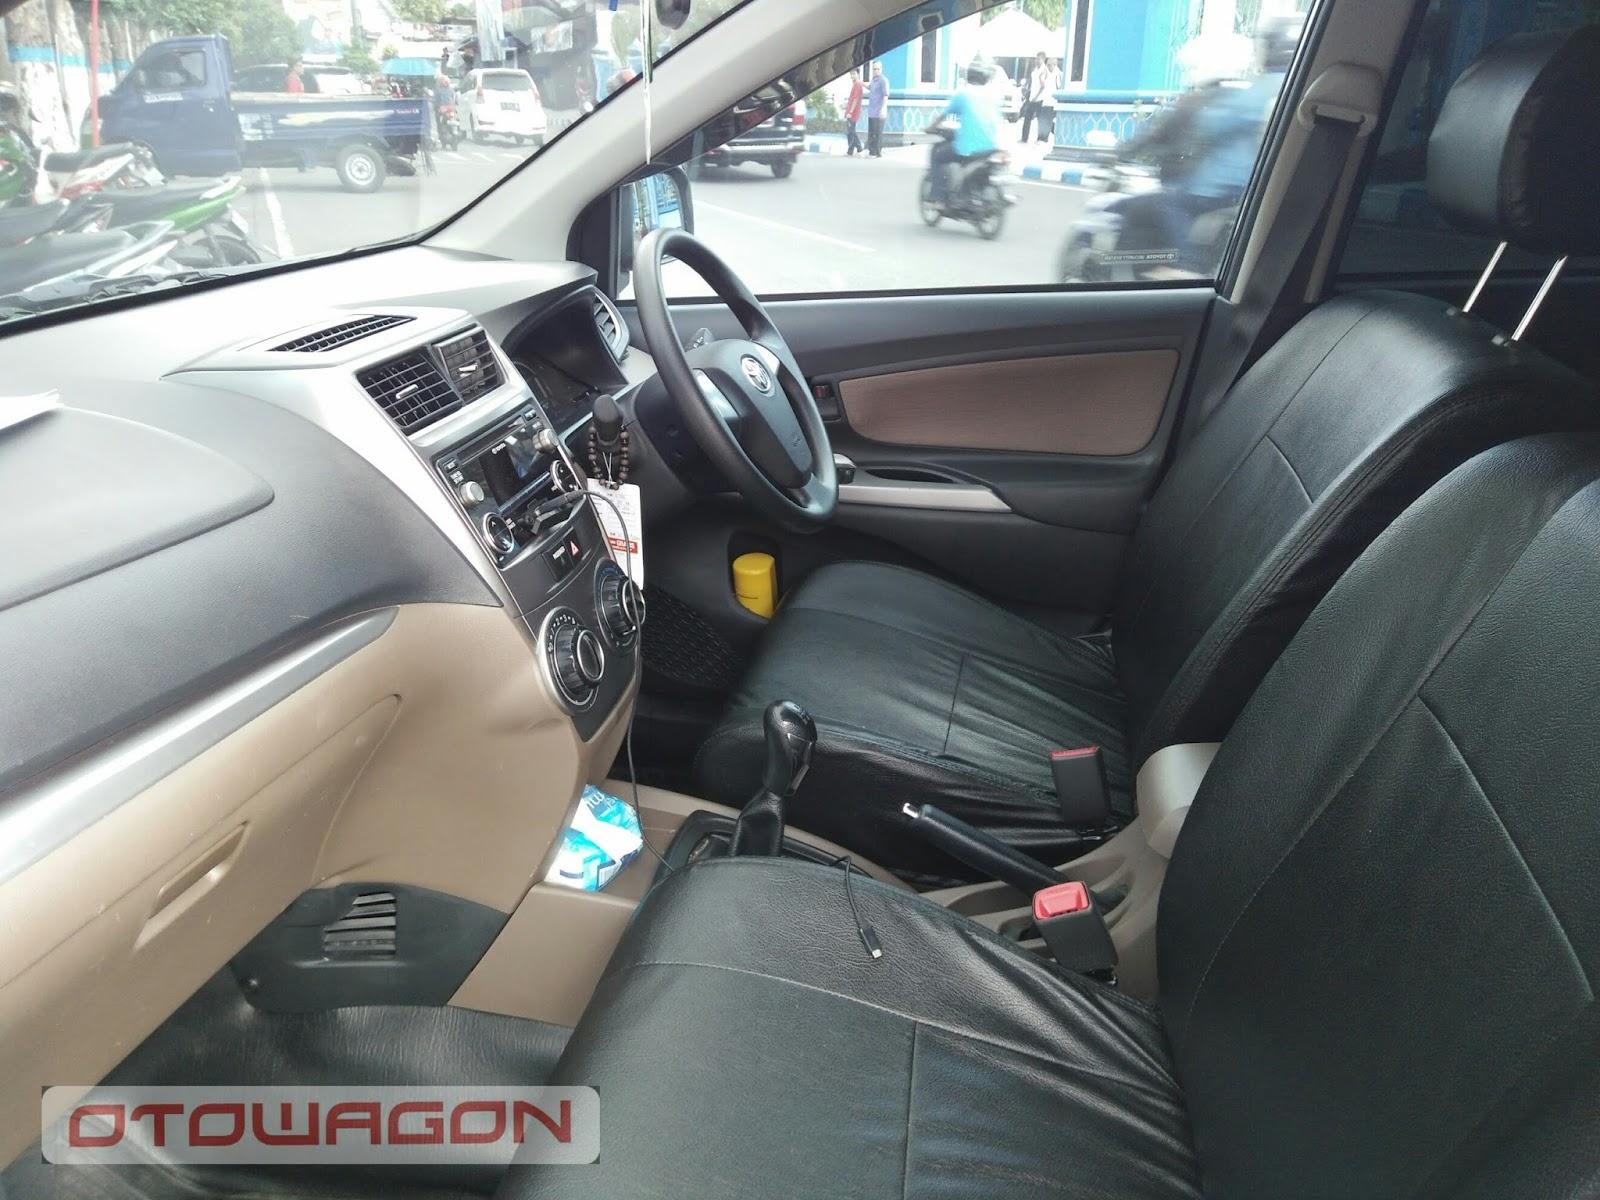 Grand New Avanza Limbung Brand Toyota Alphard Price In Malaysia Otowagon G 1 3 Tahun 2016 Peningkatan Maksimal Sehingga Jika Pengendaraan Readers Sesuai Dengan Kriteria Eco Drive Maka Lampu Indikator Akan Menyala